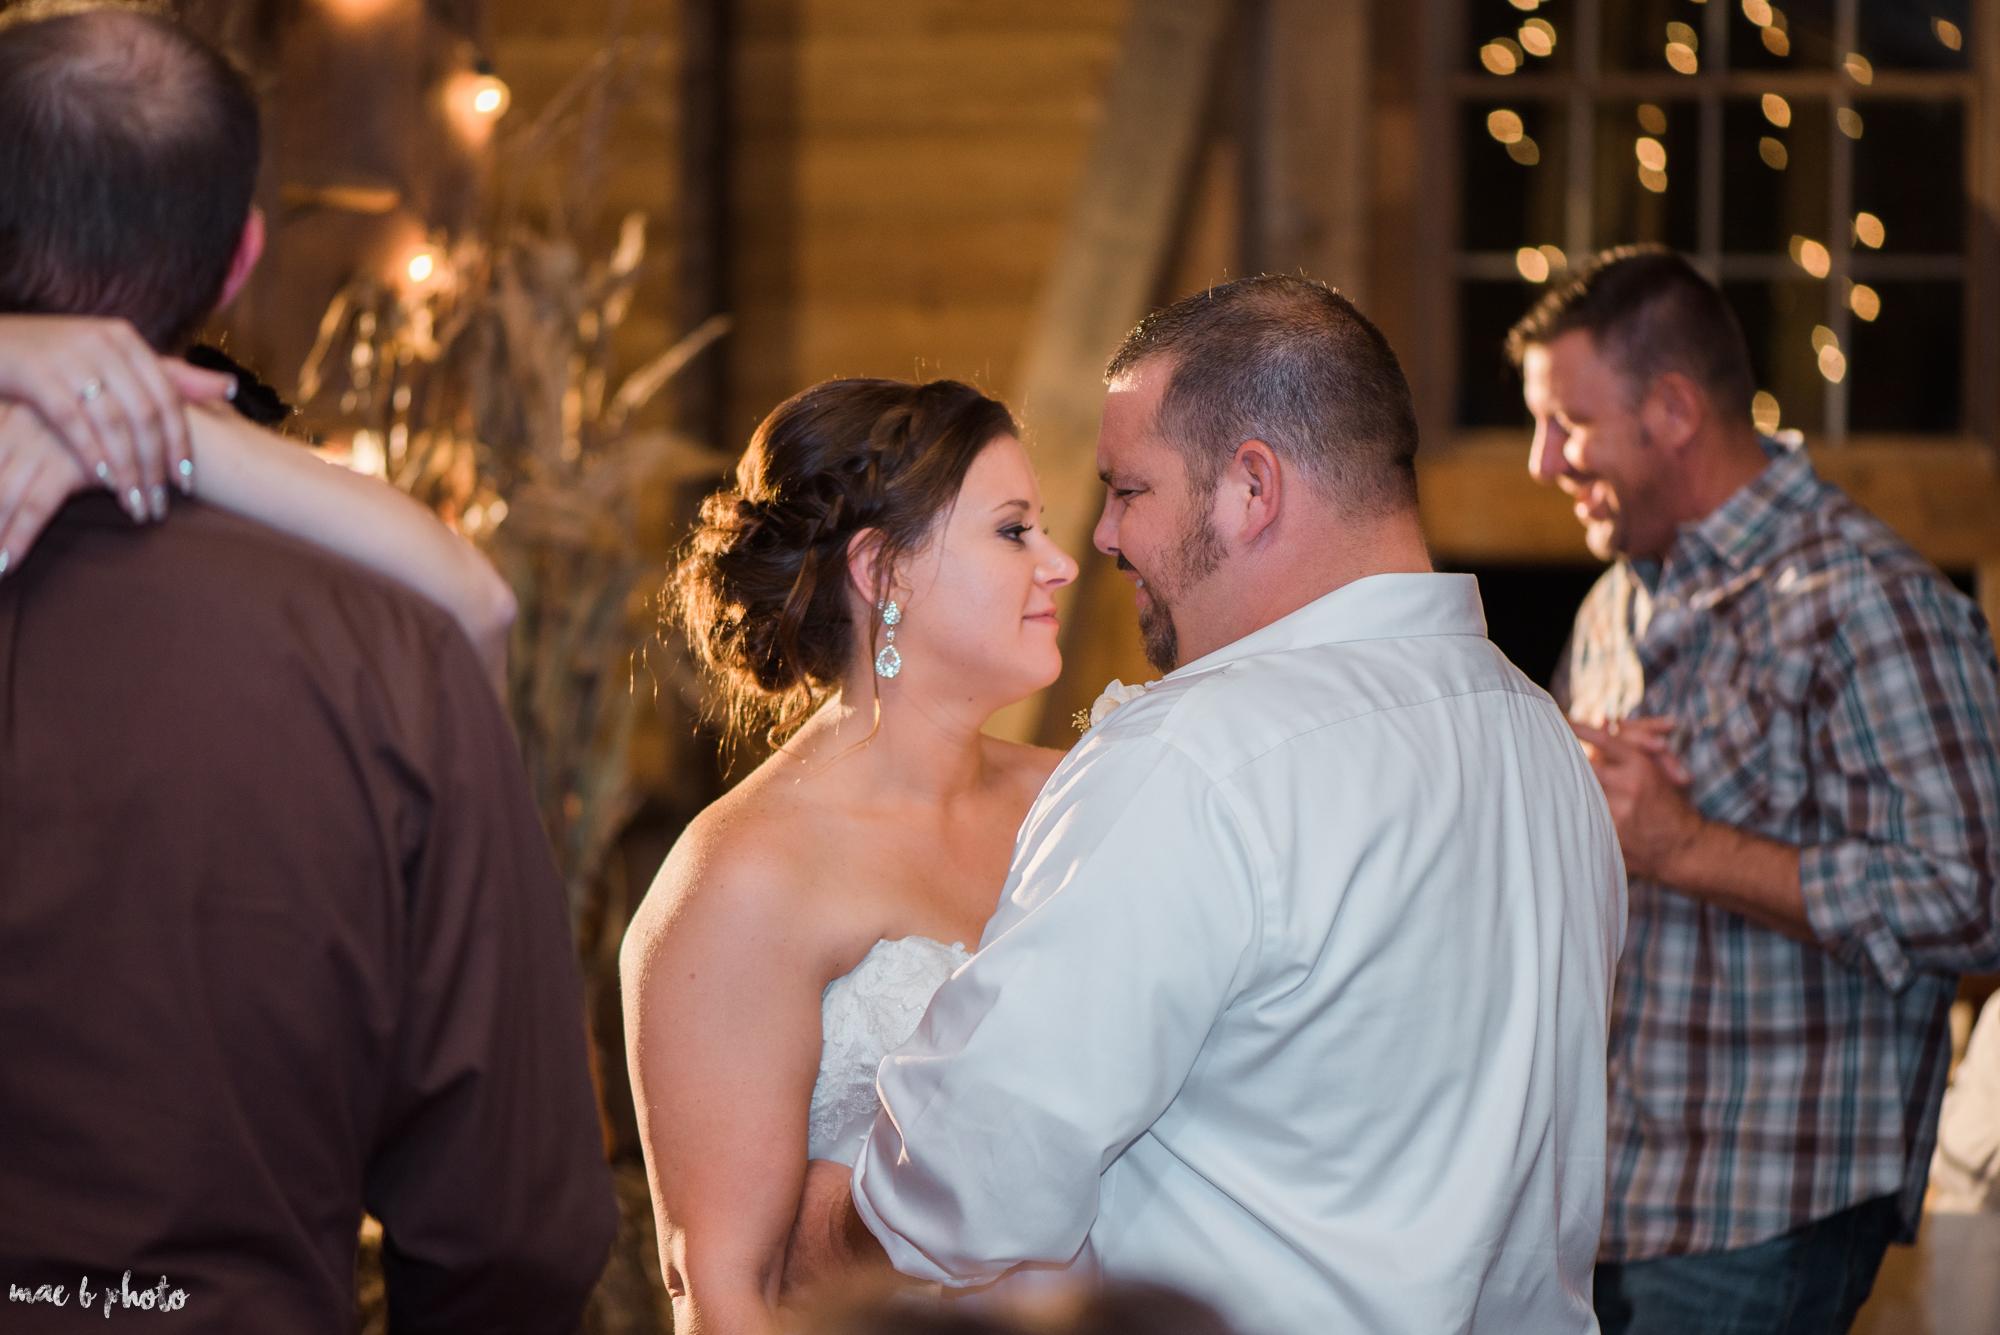 Sarah & Dustin's Rustic Chic Barn Wedding at Hartford Hill Winery in Hartford, Ohio by Mae B Photo-119.jpg